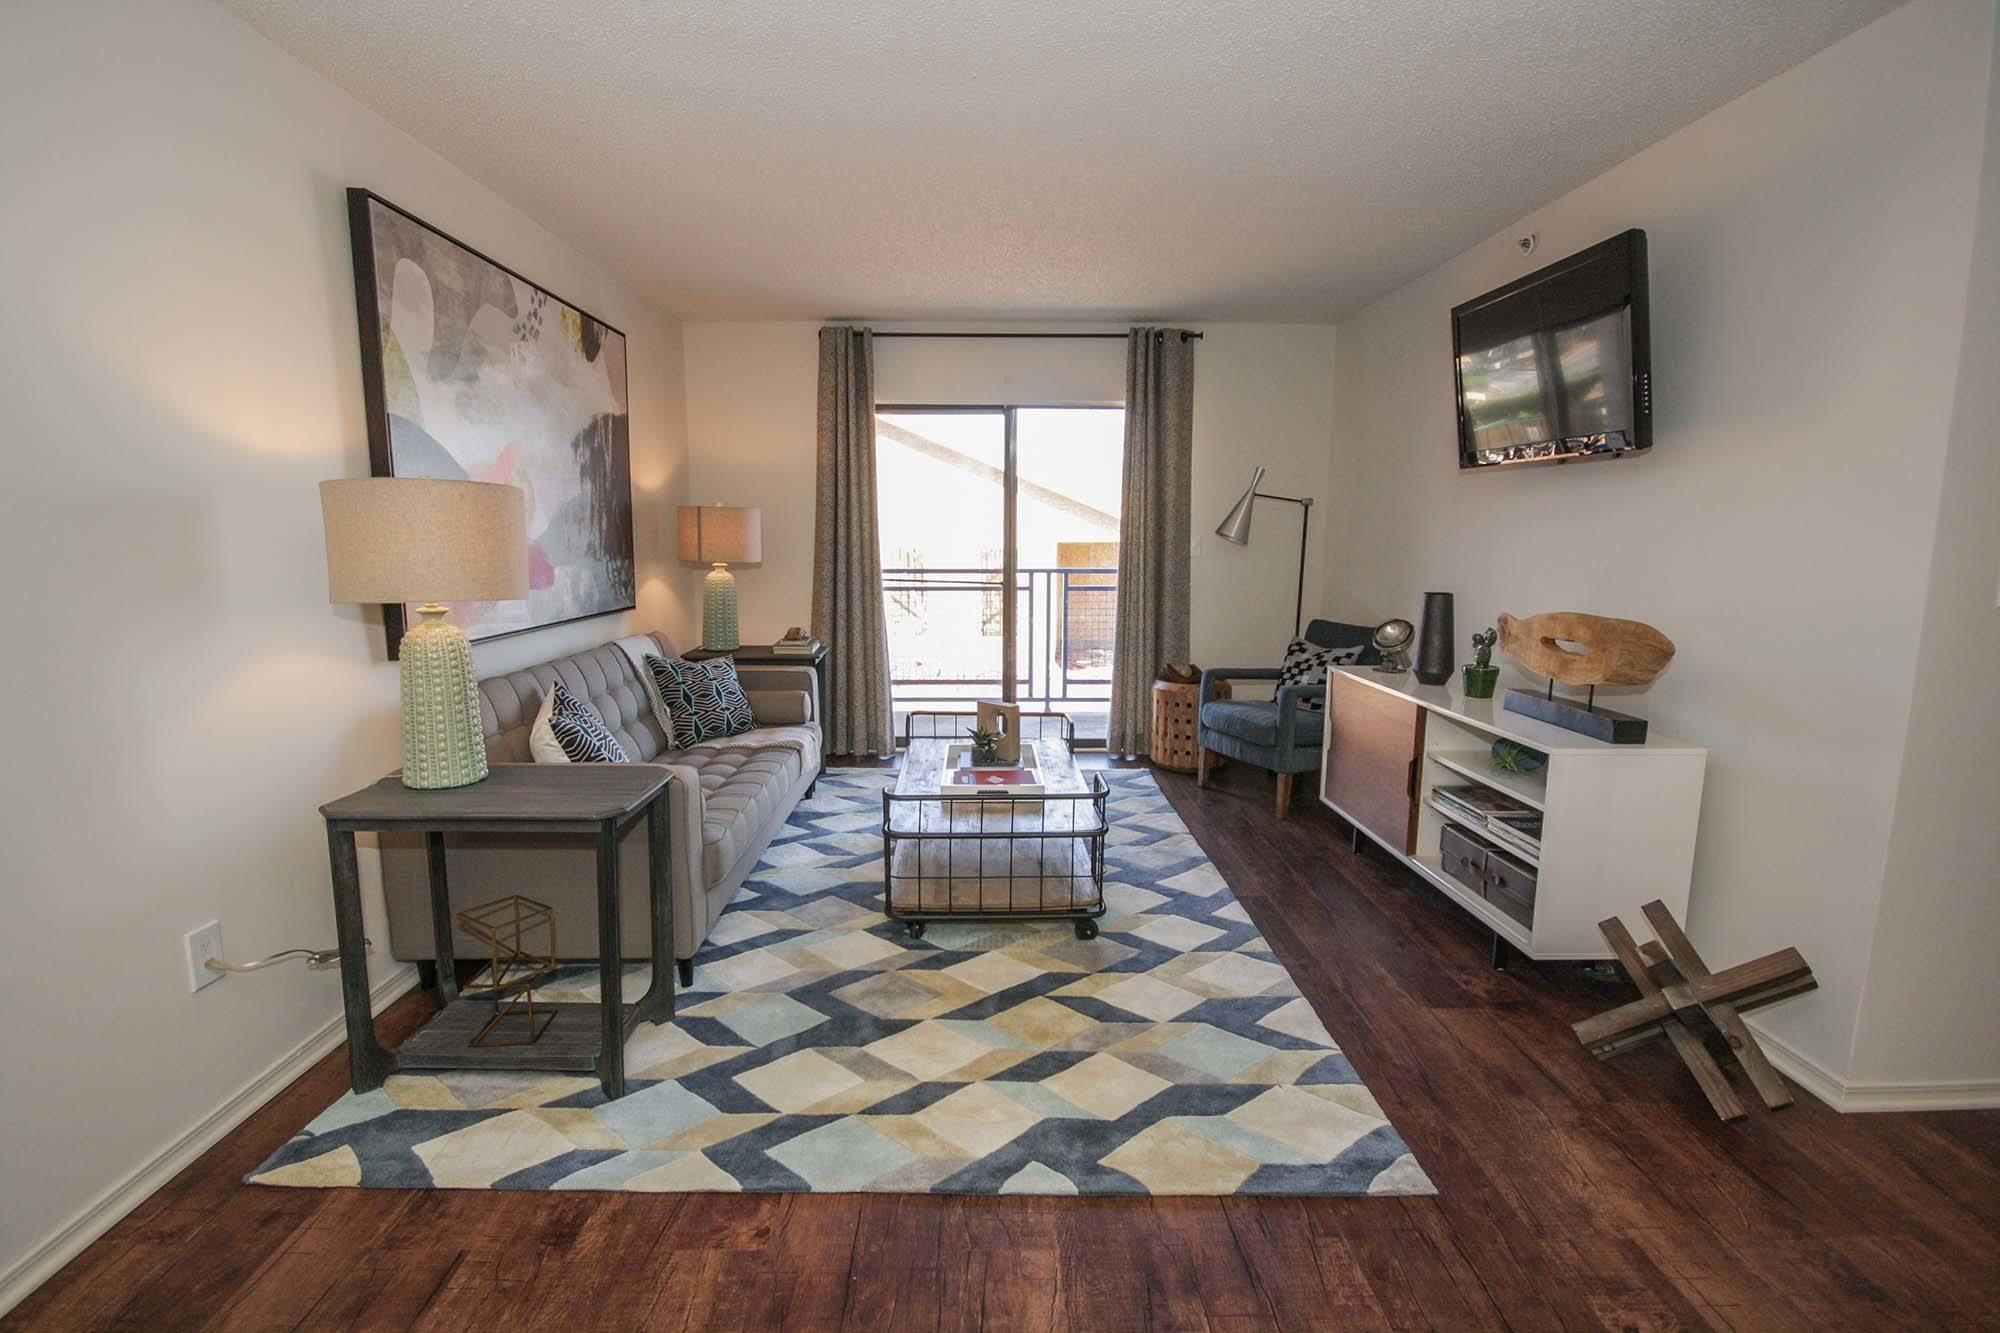 Southeast marietta ga apartments for rent the grandstand - Cheap 2 bedroom apartments in marietta ga ...